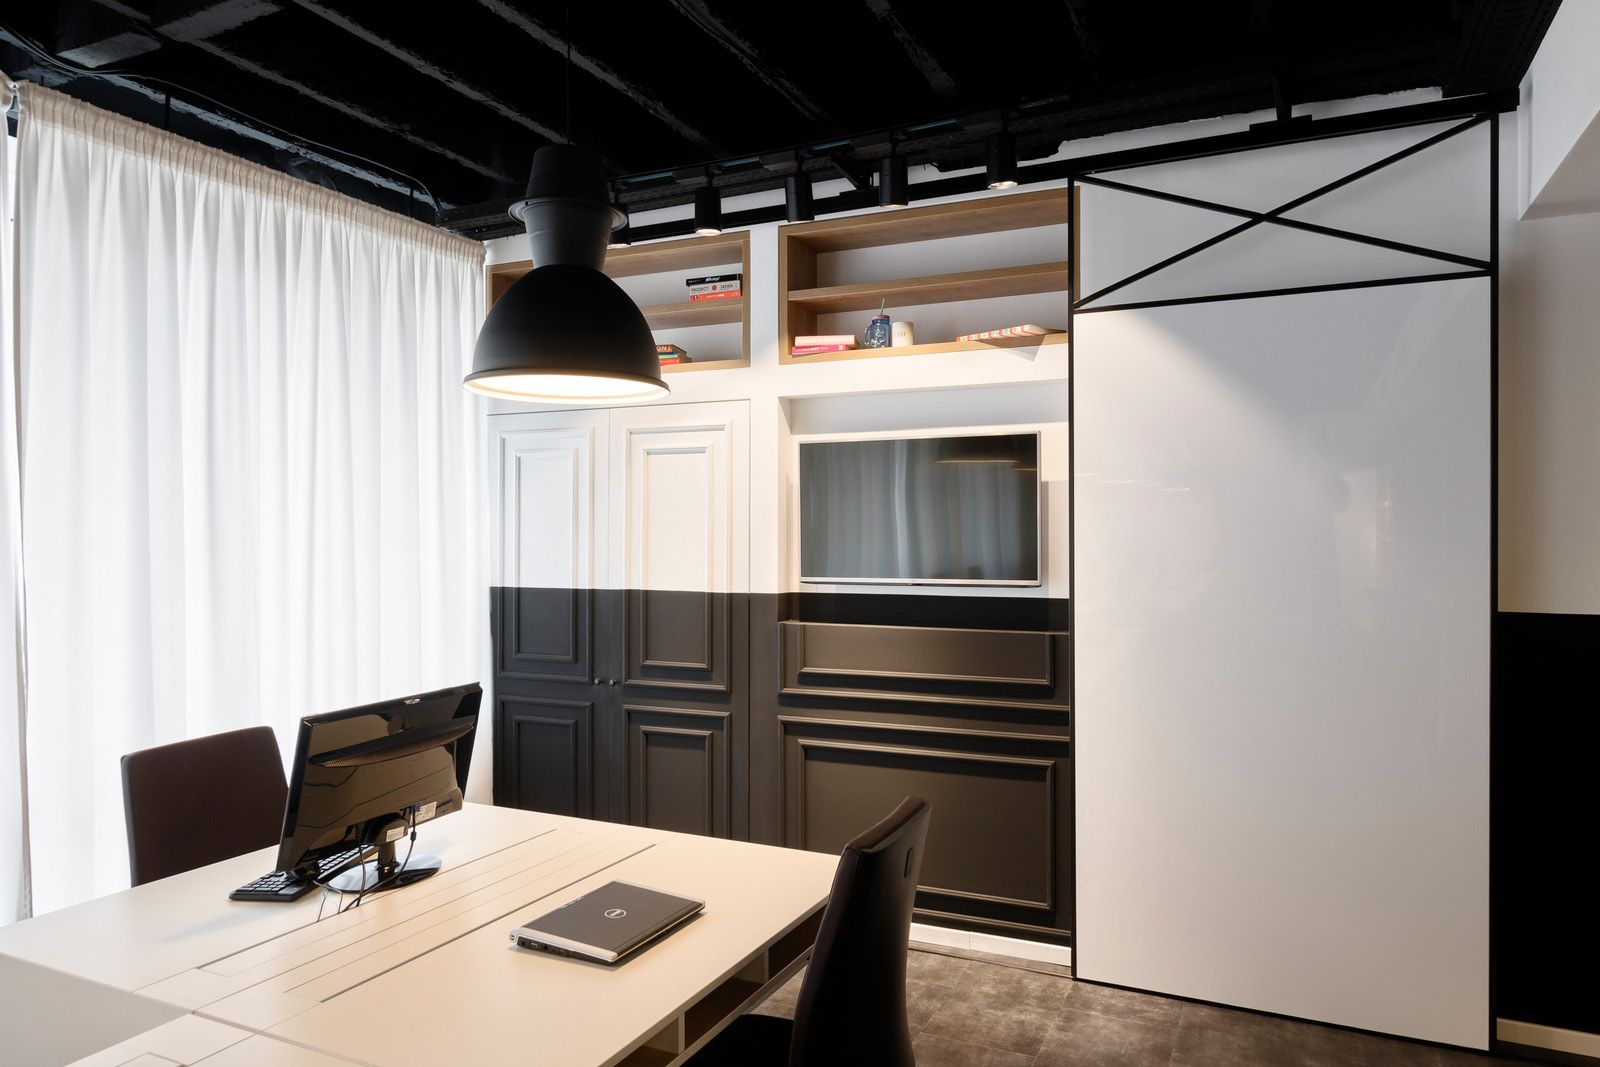 Studio OBE | 塞尔维亚欧莱雅办公室